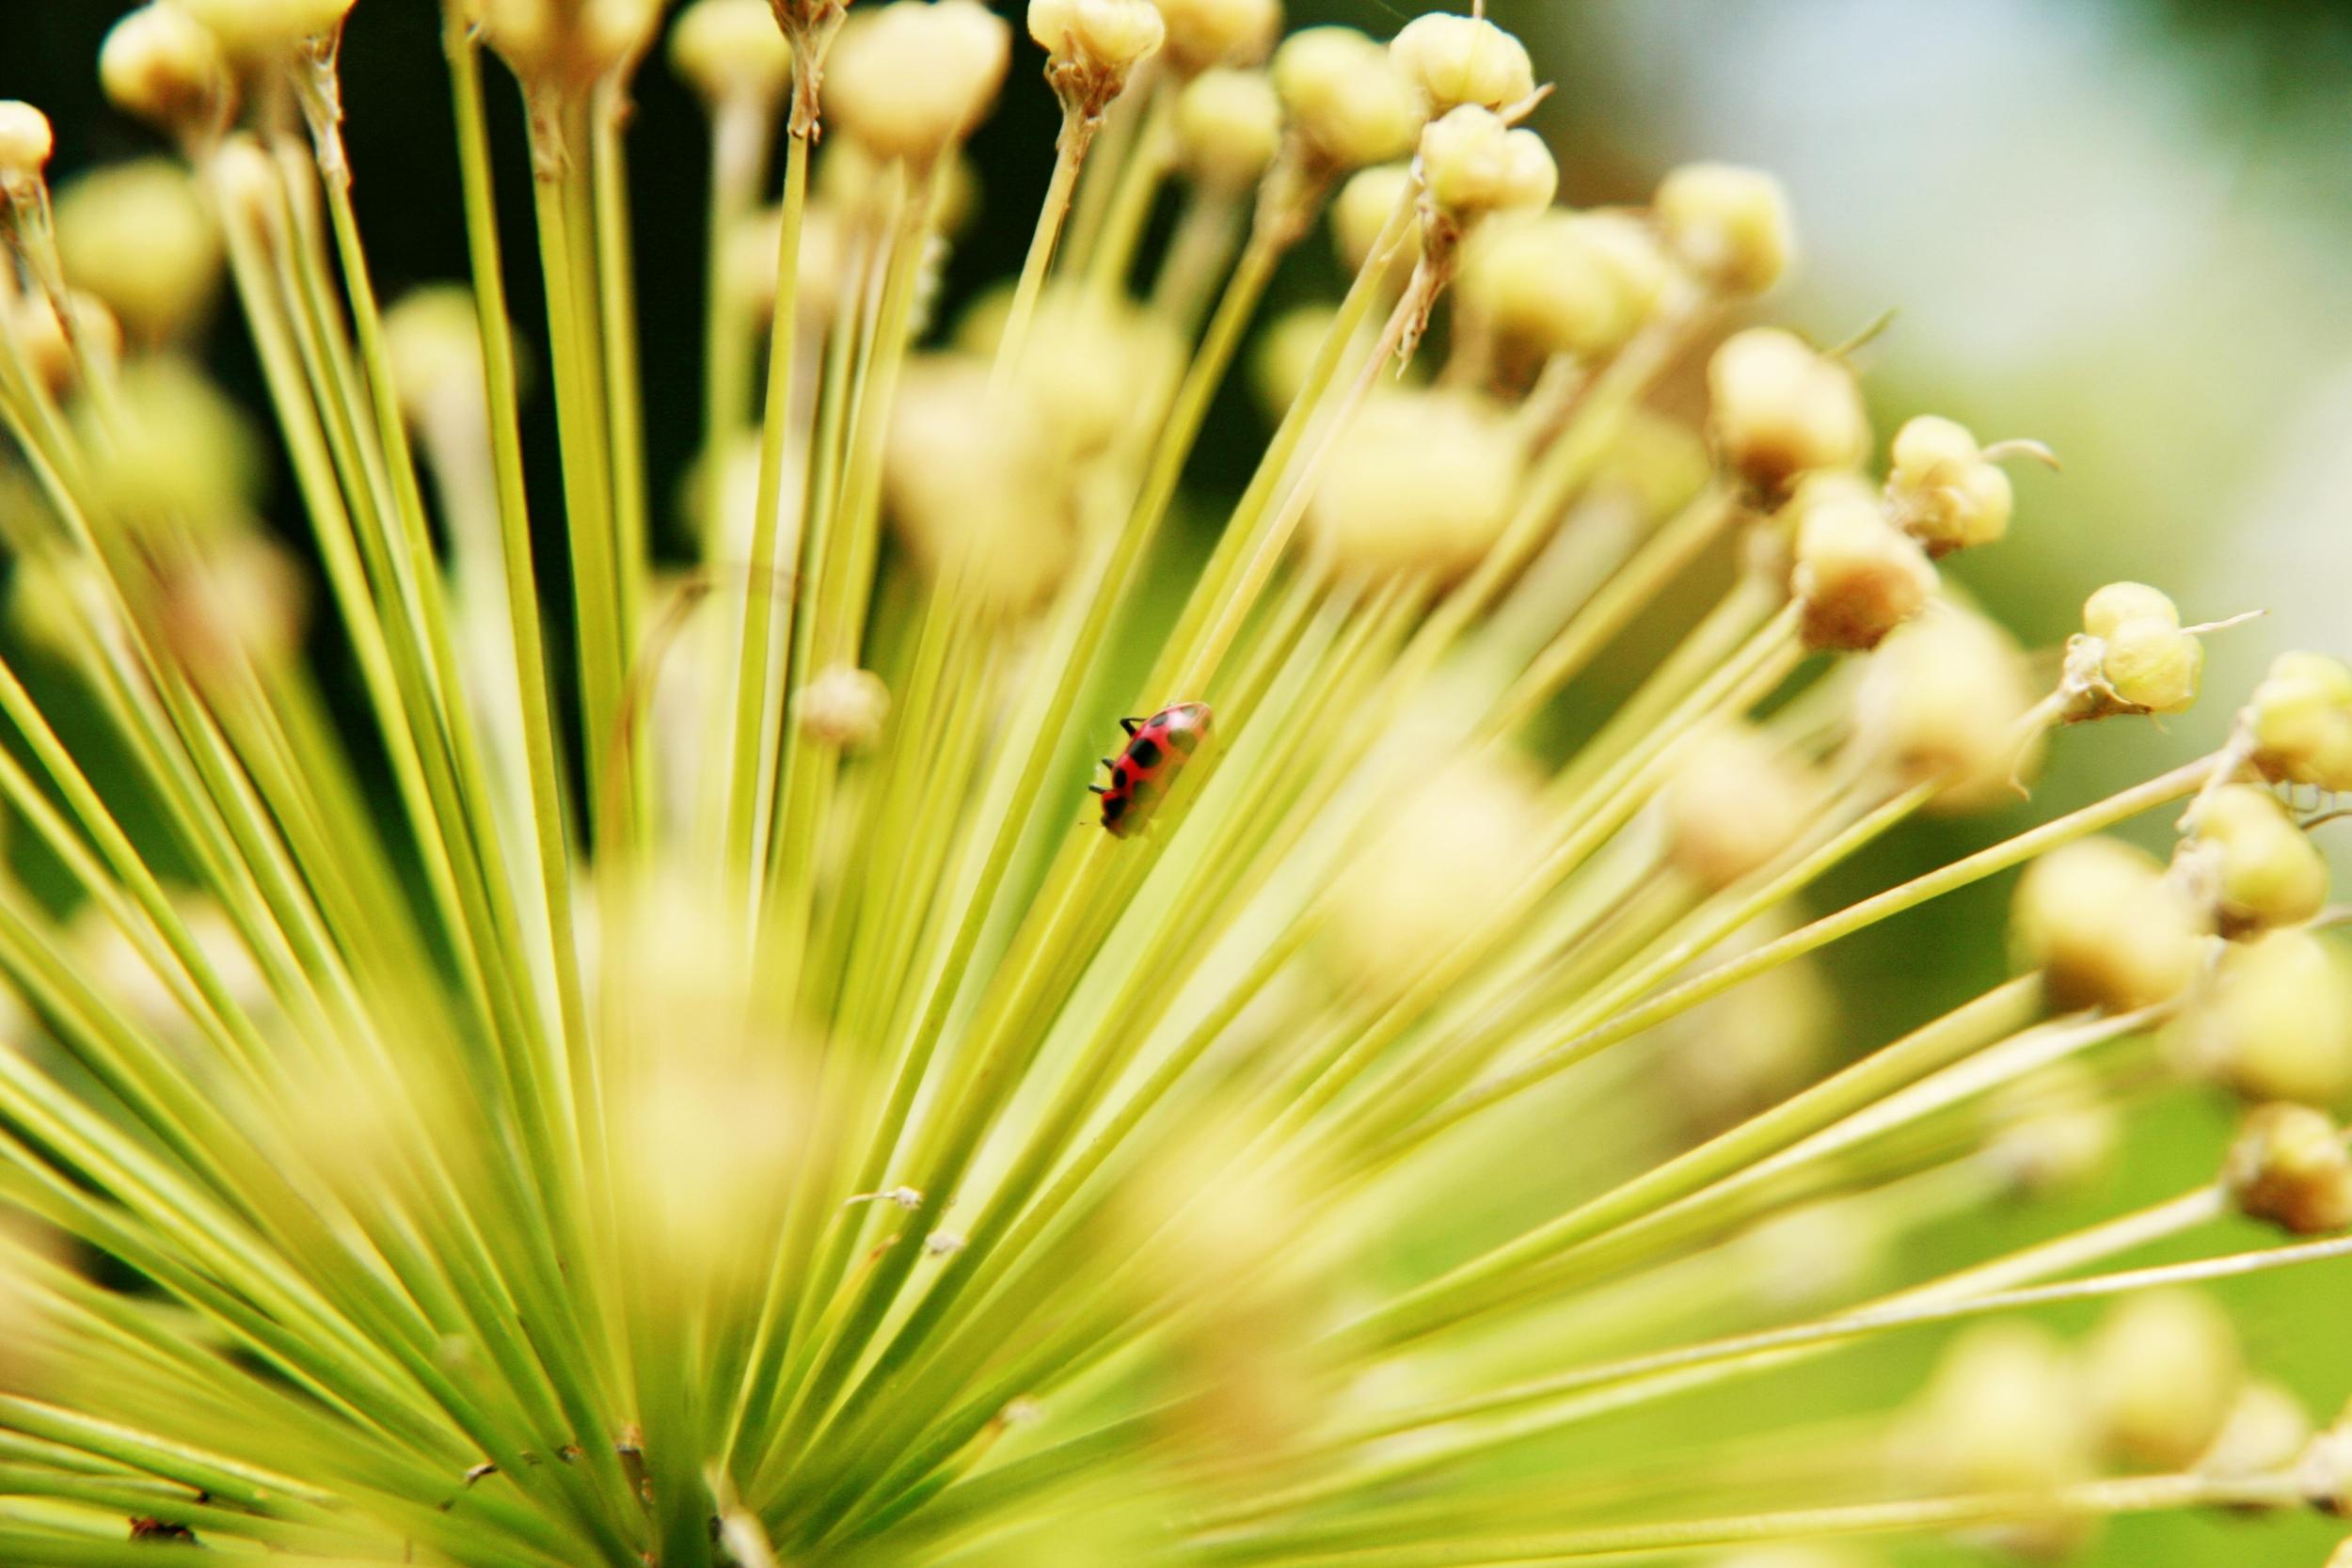 Ladybug2,green,red.jpg